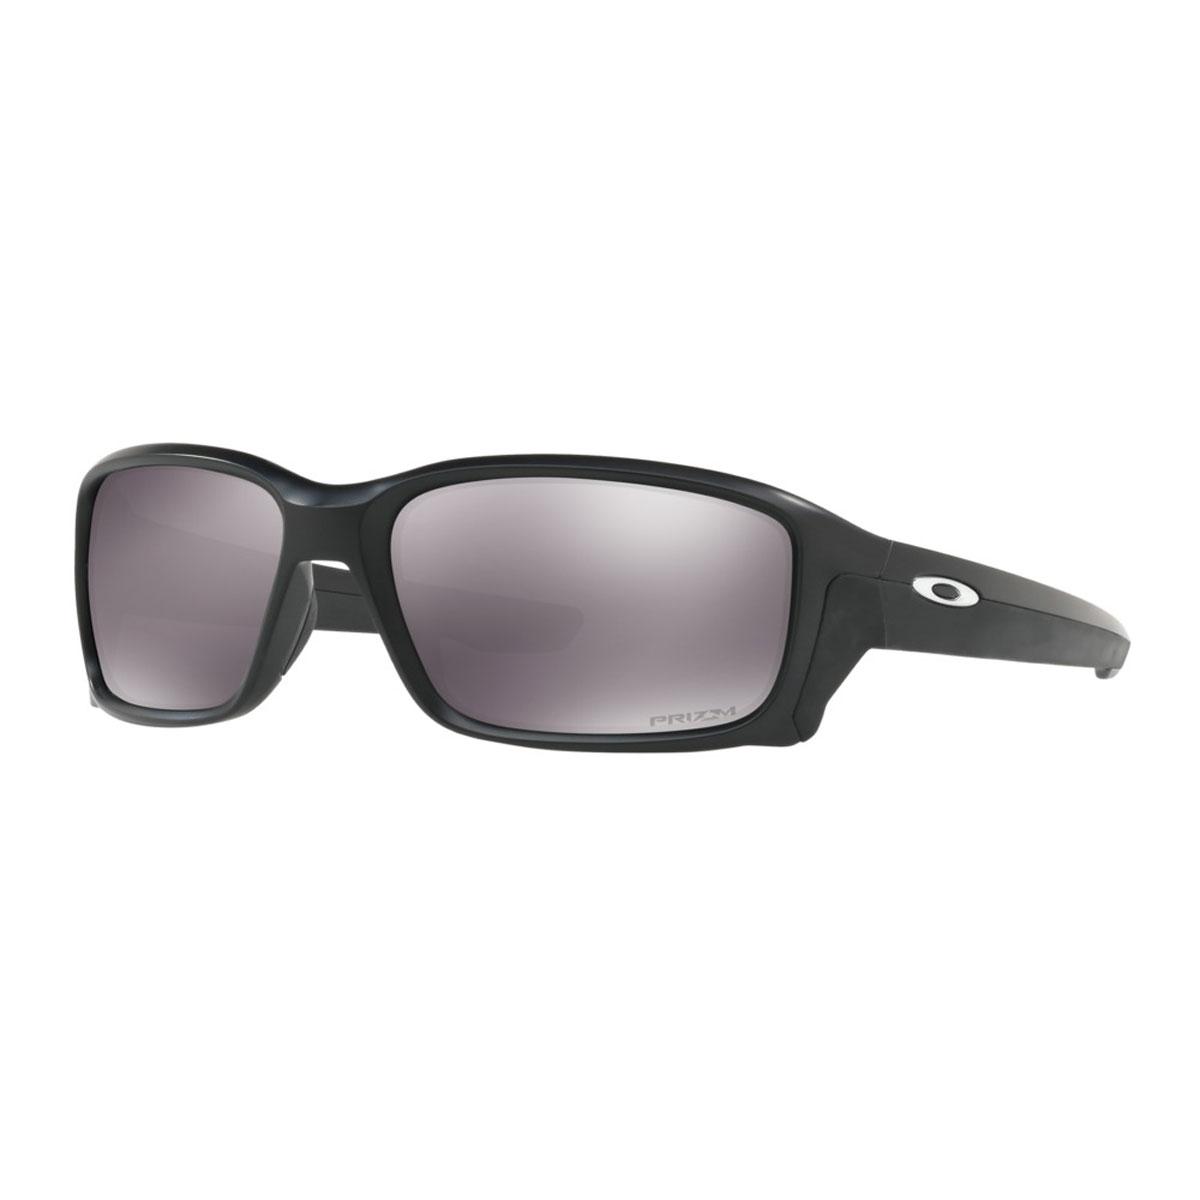 8bb8e04d05 Image of Oakley Straightlink Prizm Sunglasses - Matte Black   Prizm Black